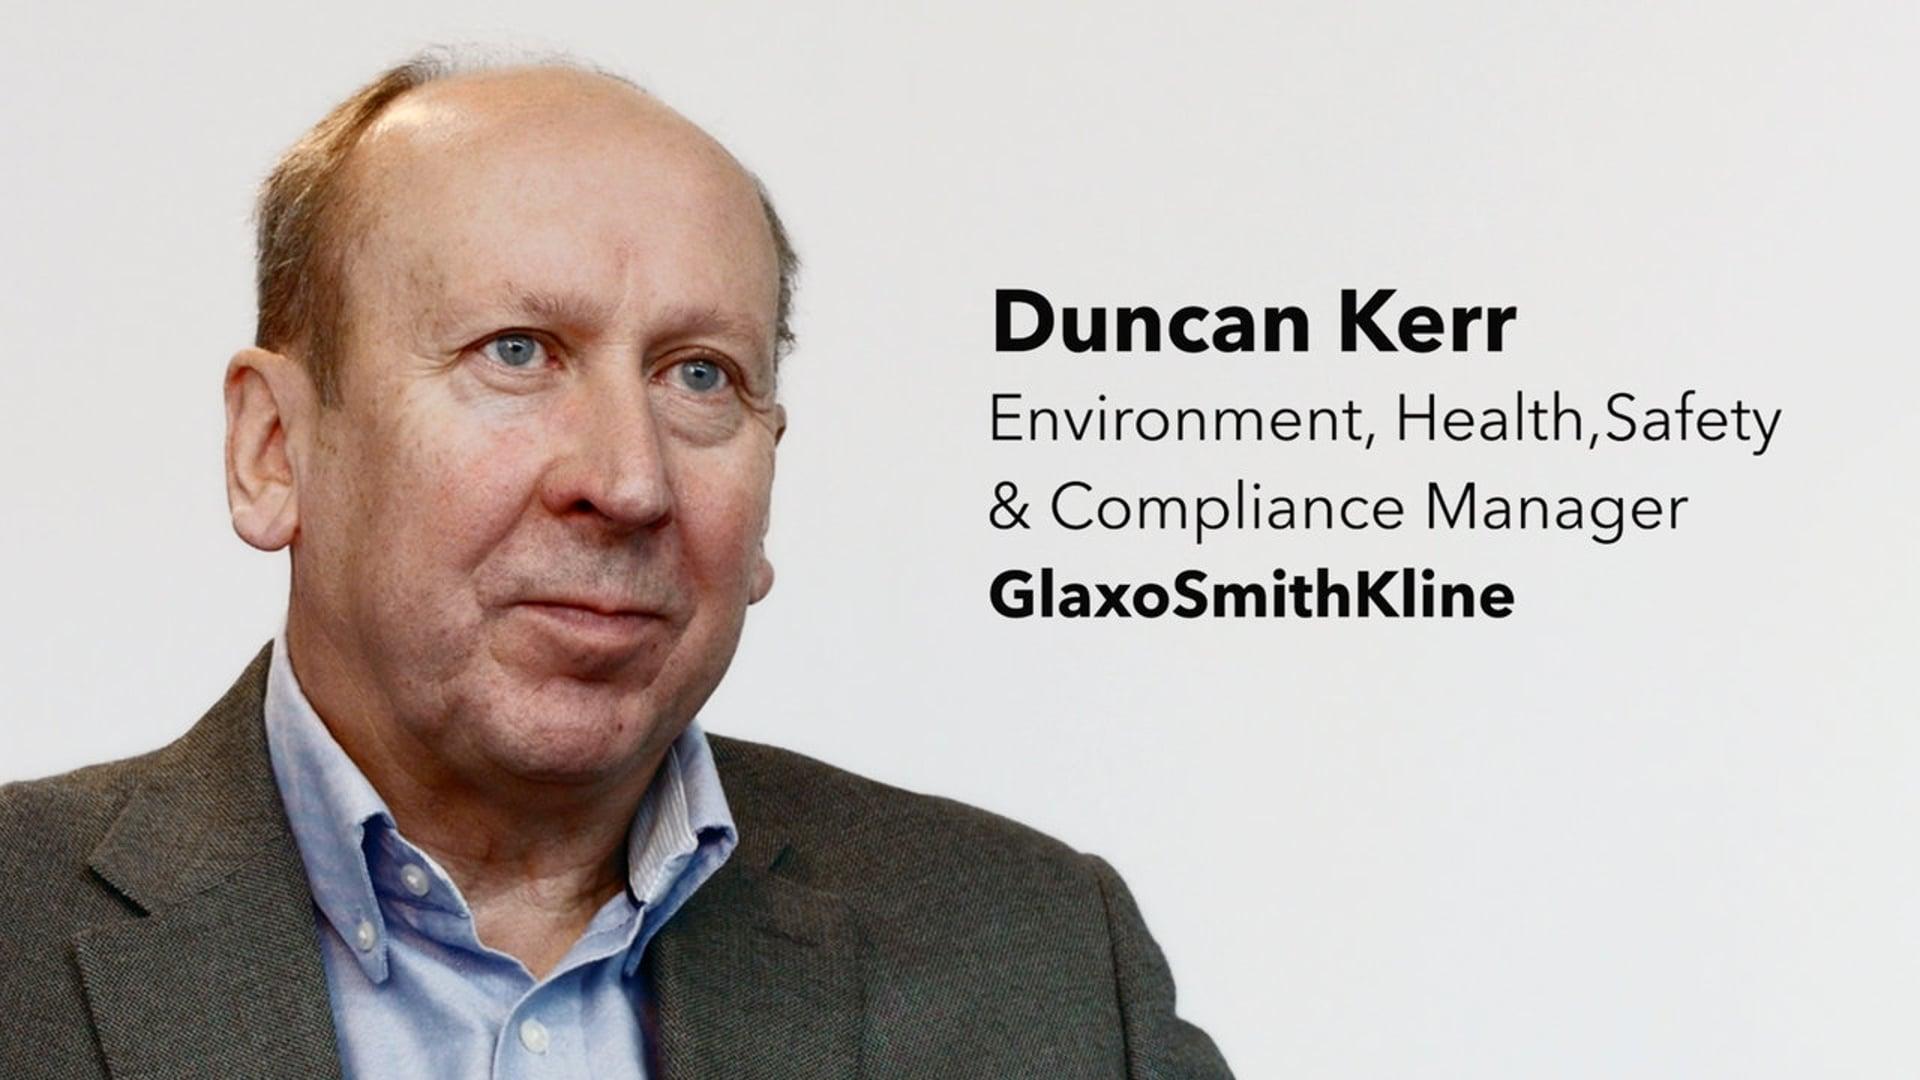 GlaxoSmithKline | Duncan Kerr